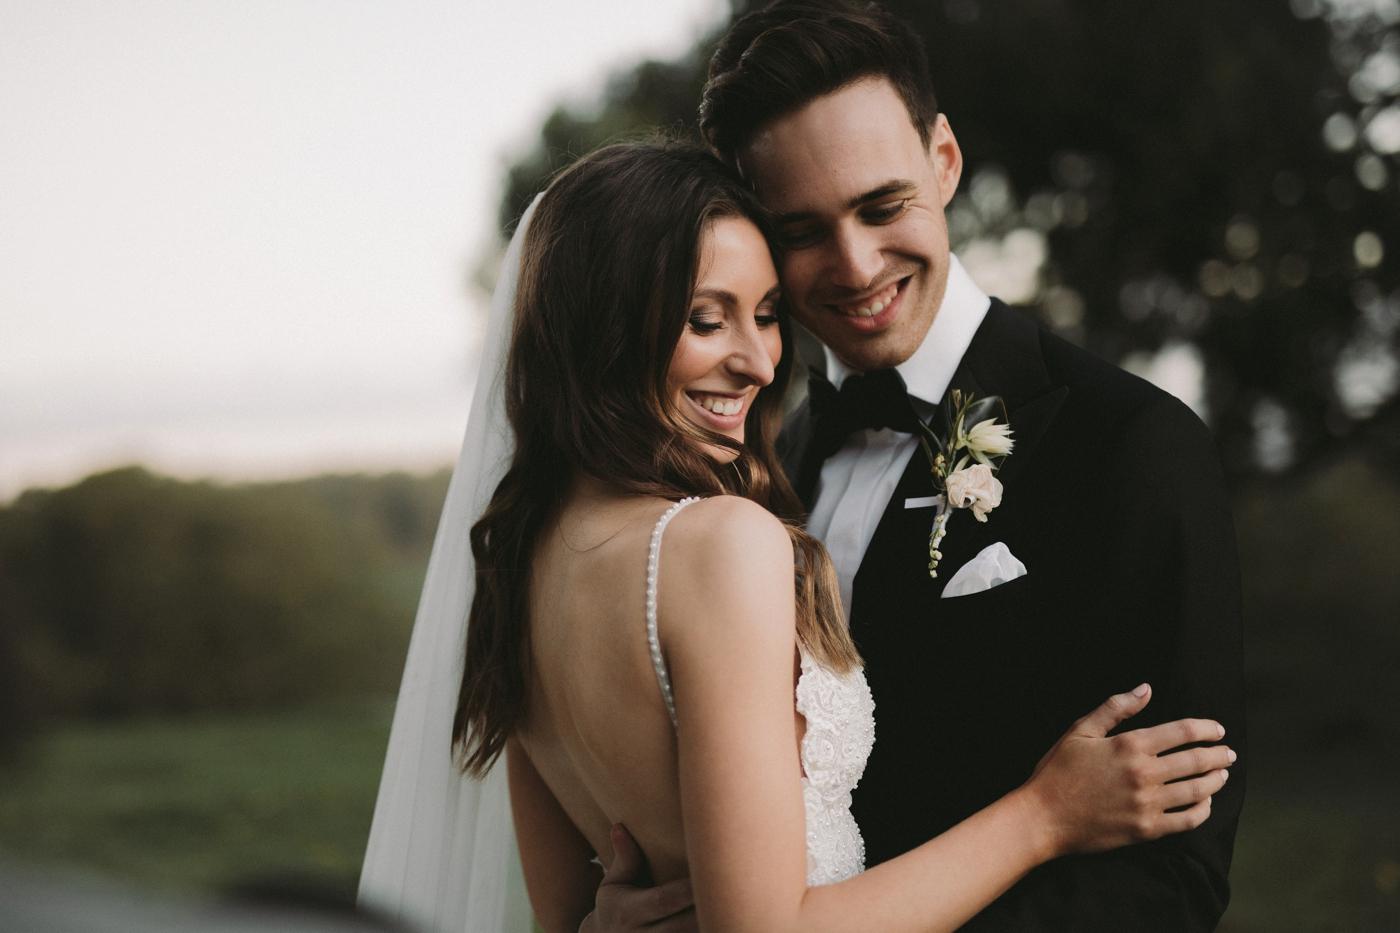 Katie and Ben - Natural Wedding Photography in Adelaide - Beautiful, Candid Wedding Photographer - Adelaide Hills Wedding - Katherine Schultz - www.katherineschultzphotography.com_0082.jpg